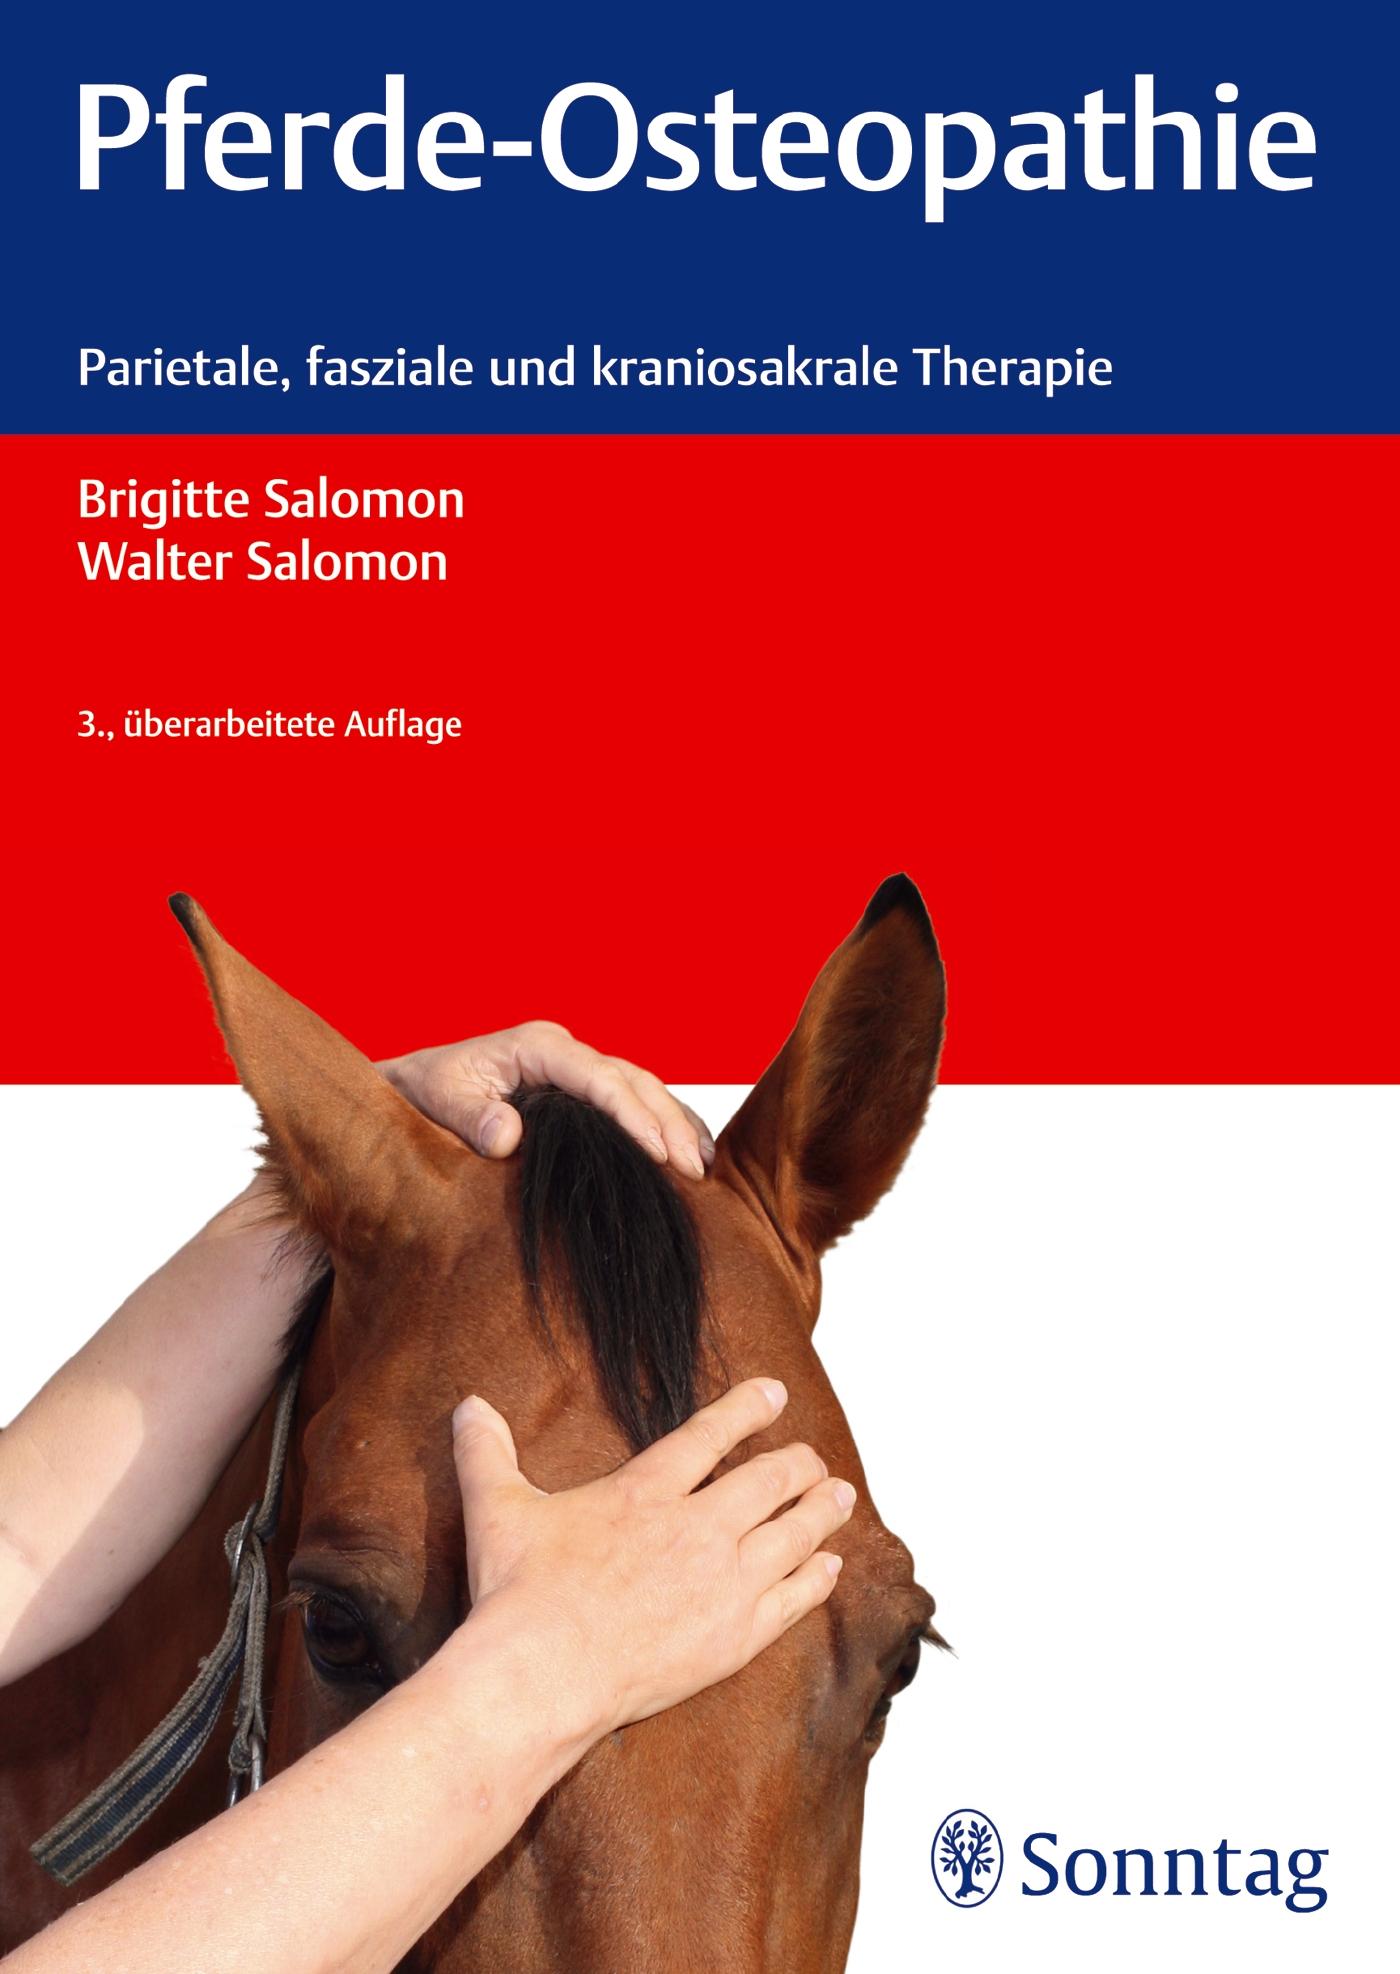 Pferde-Osteopathie: Parietale, fasziale und kra...